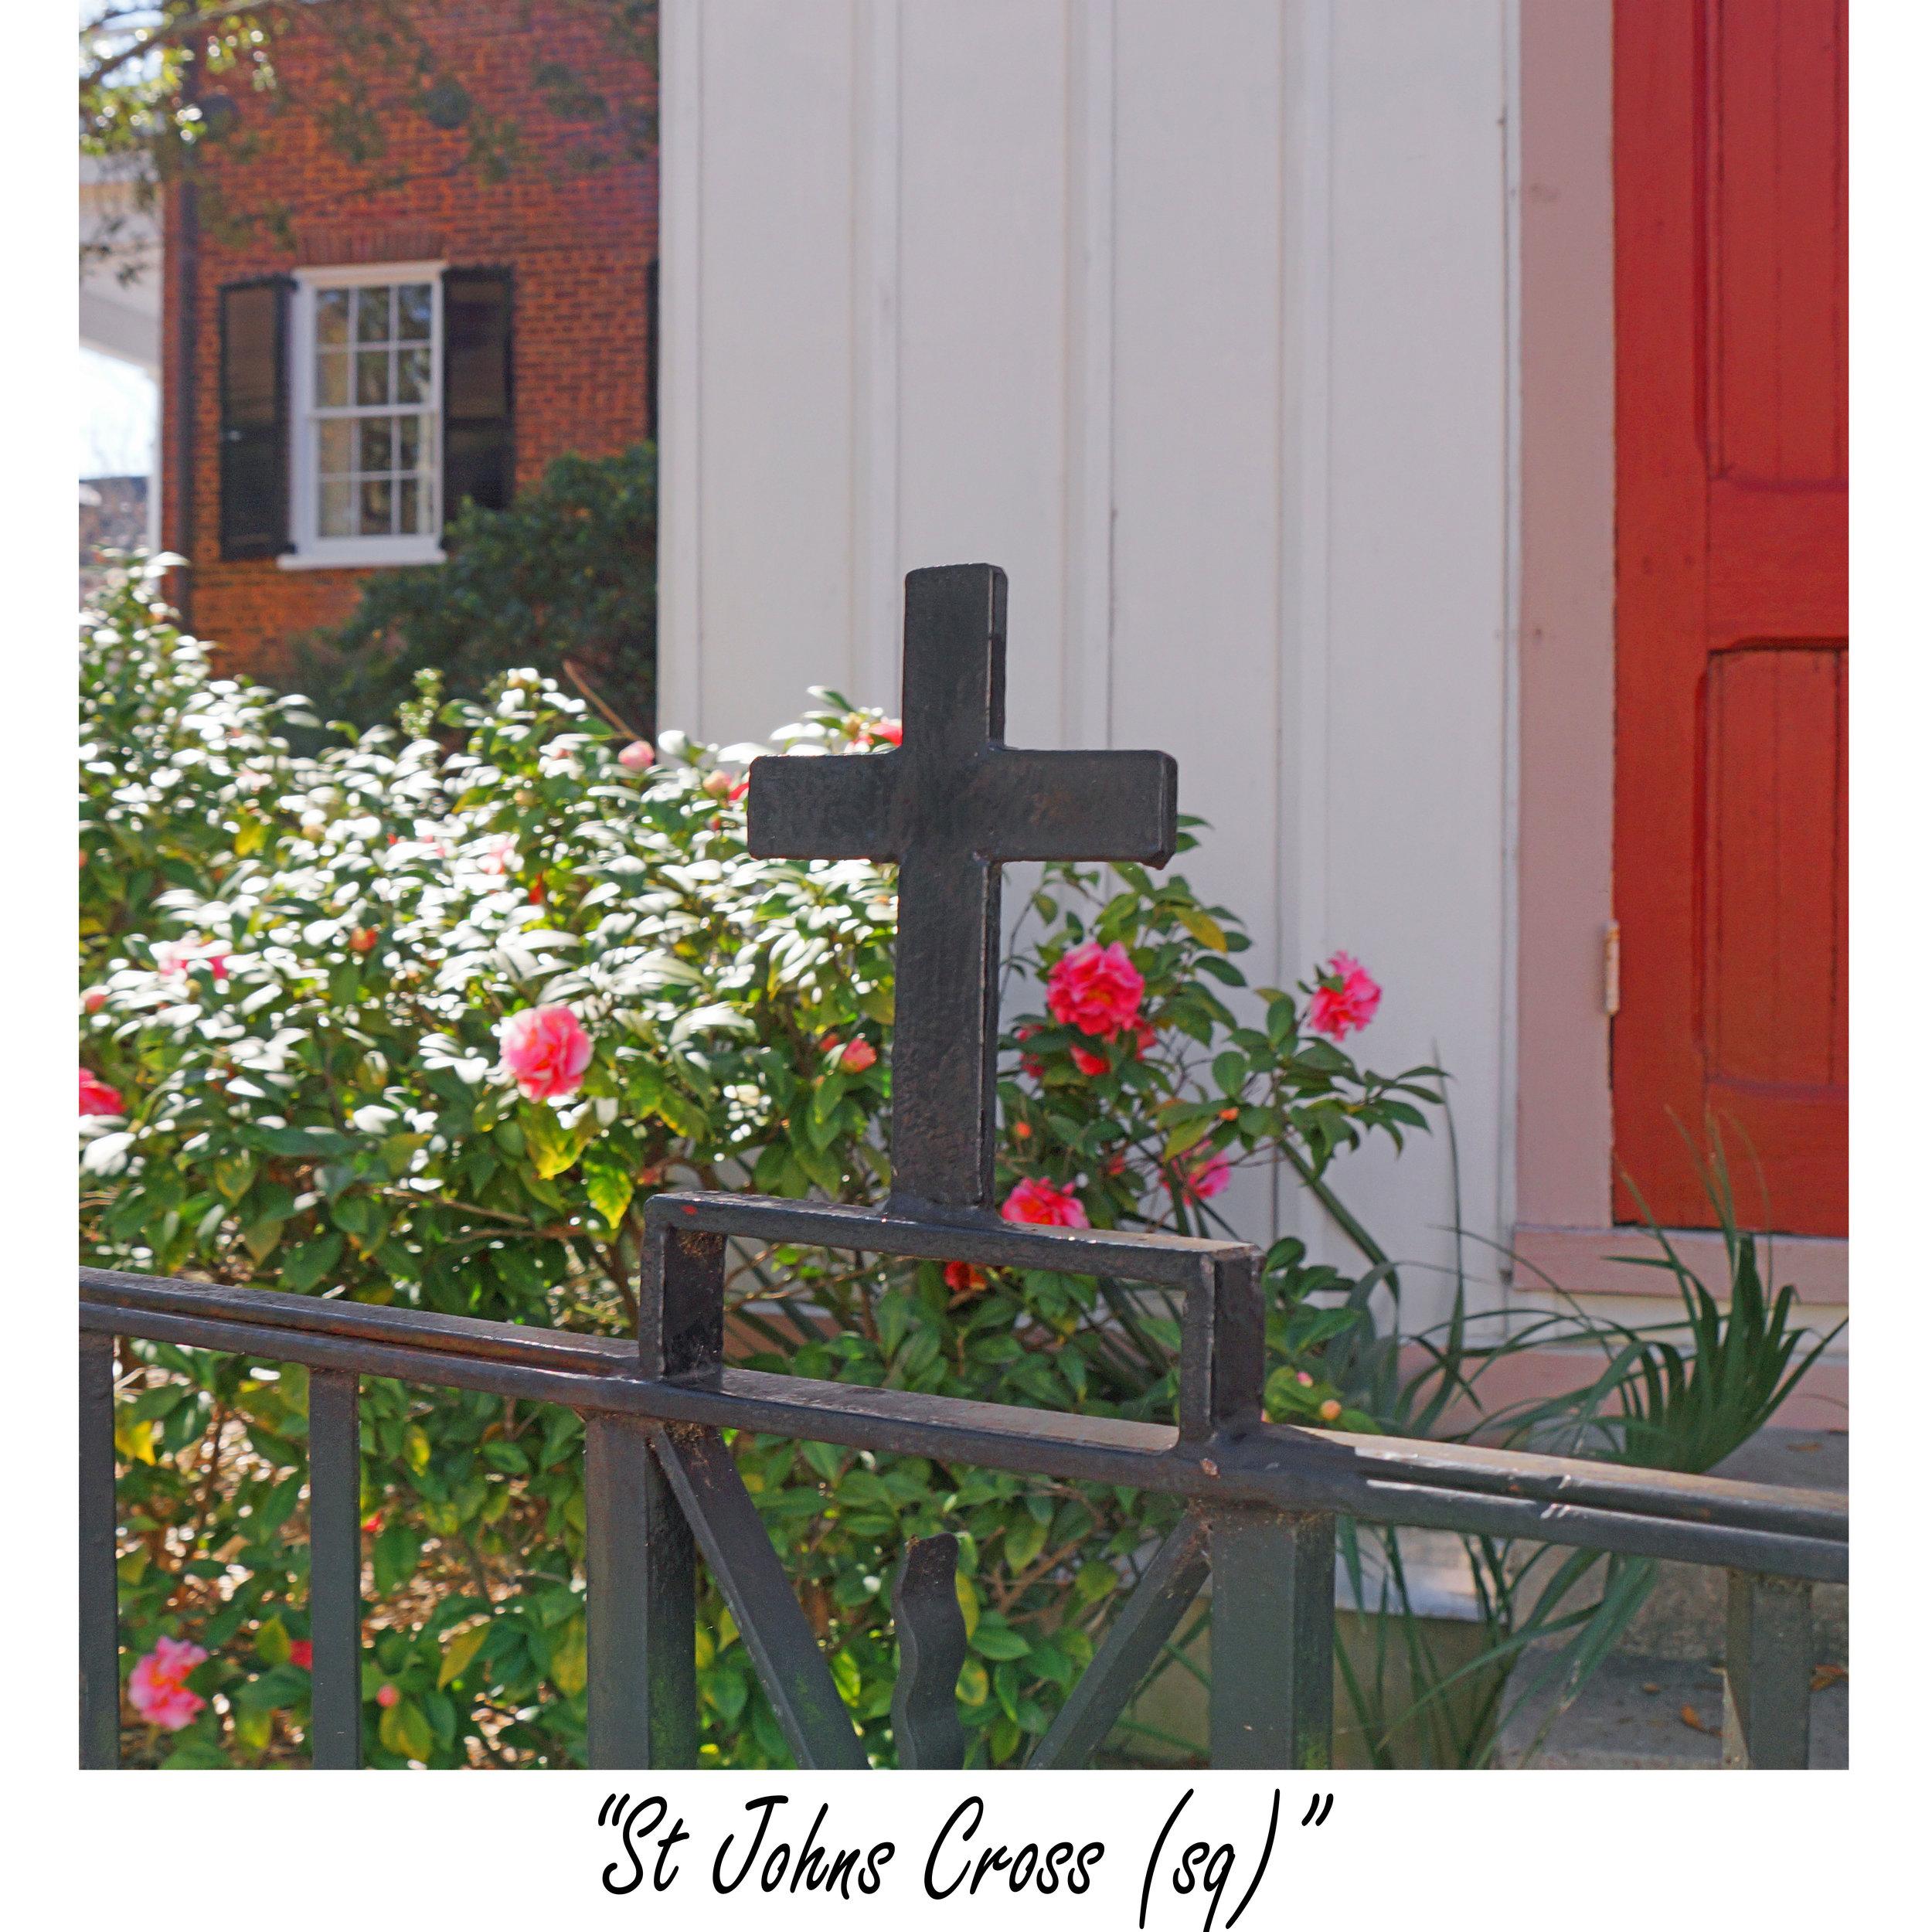 St johns cross (sq).jpg